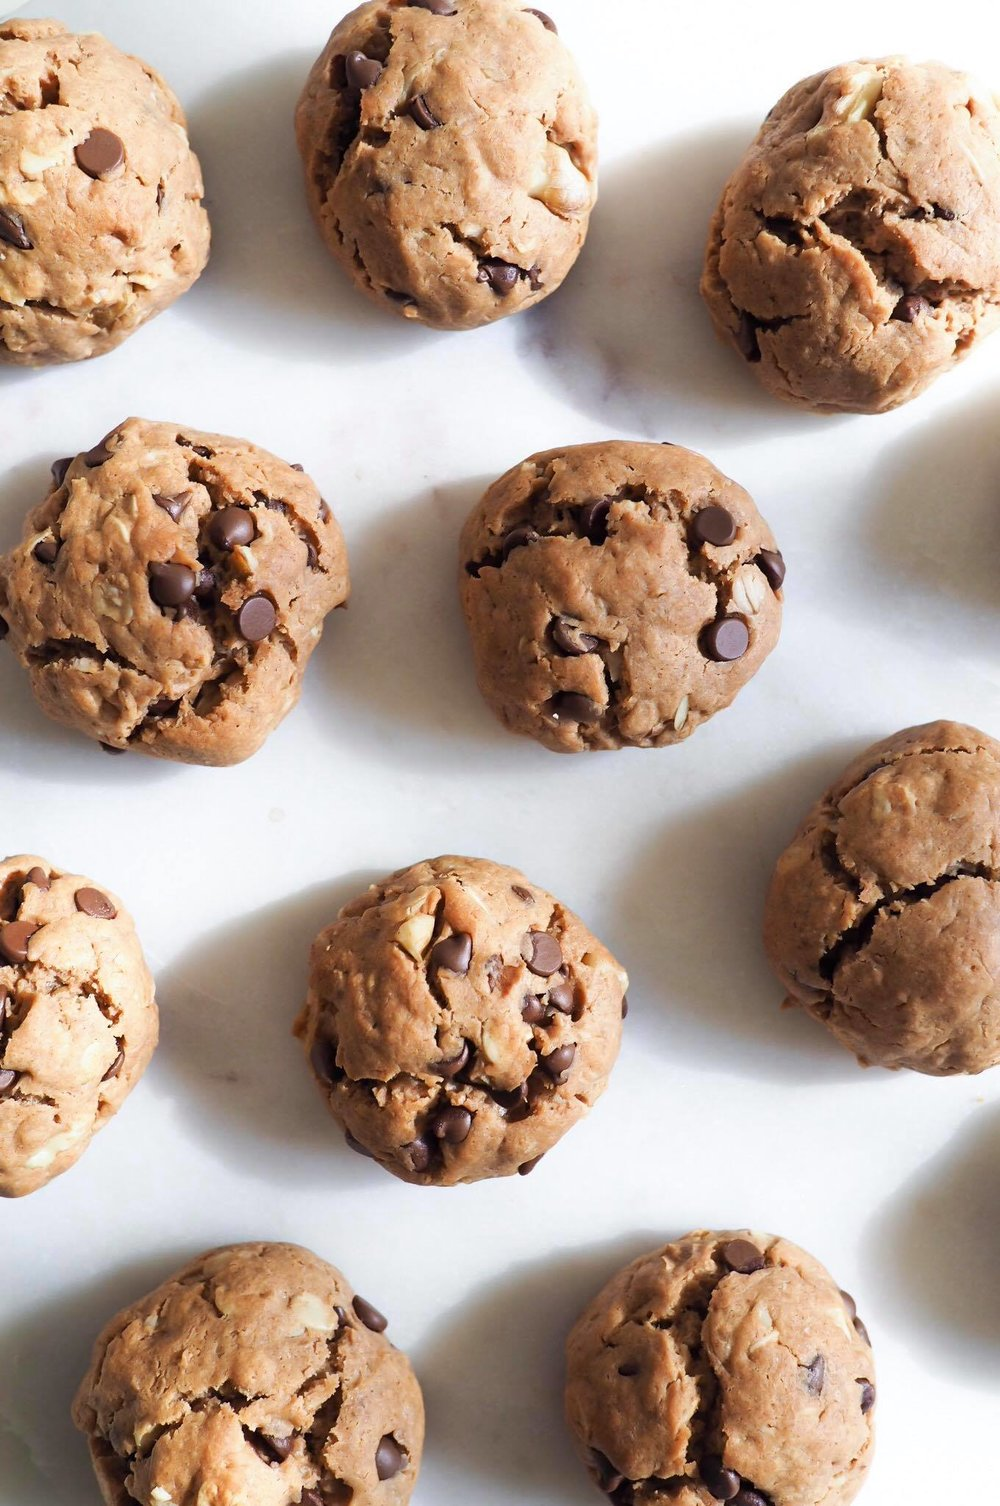 Healthy(ish) Chocolate Chip Cookies - Kris Gill